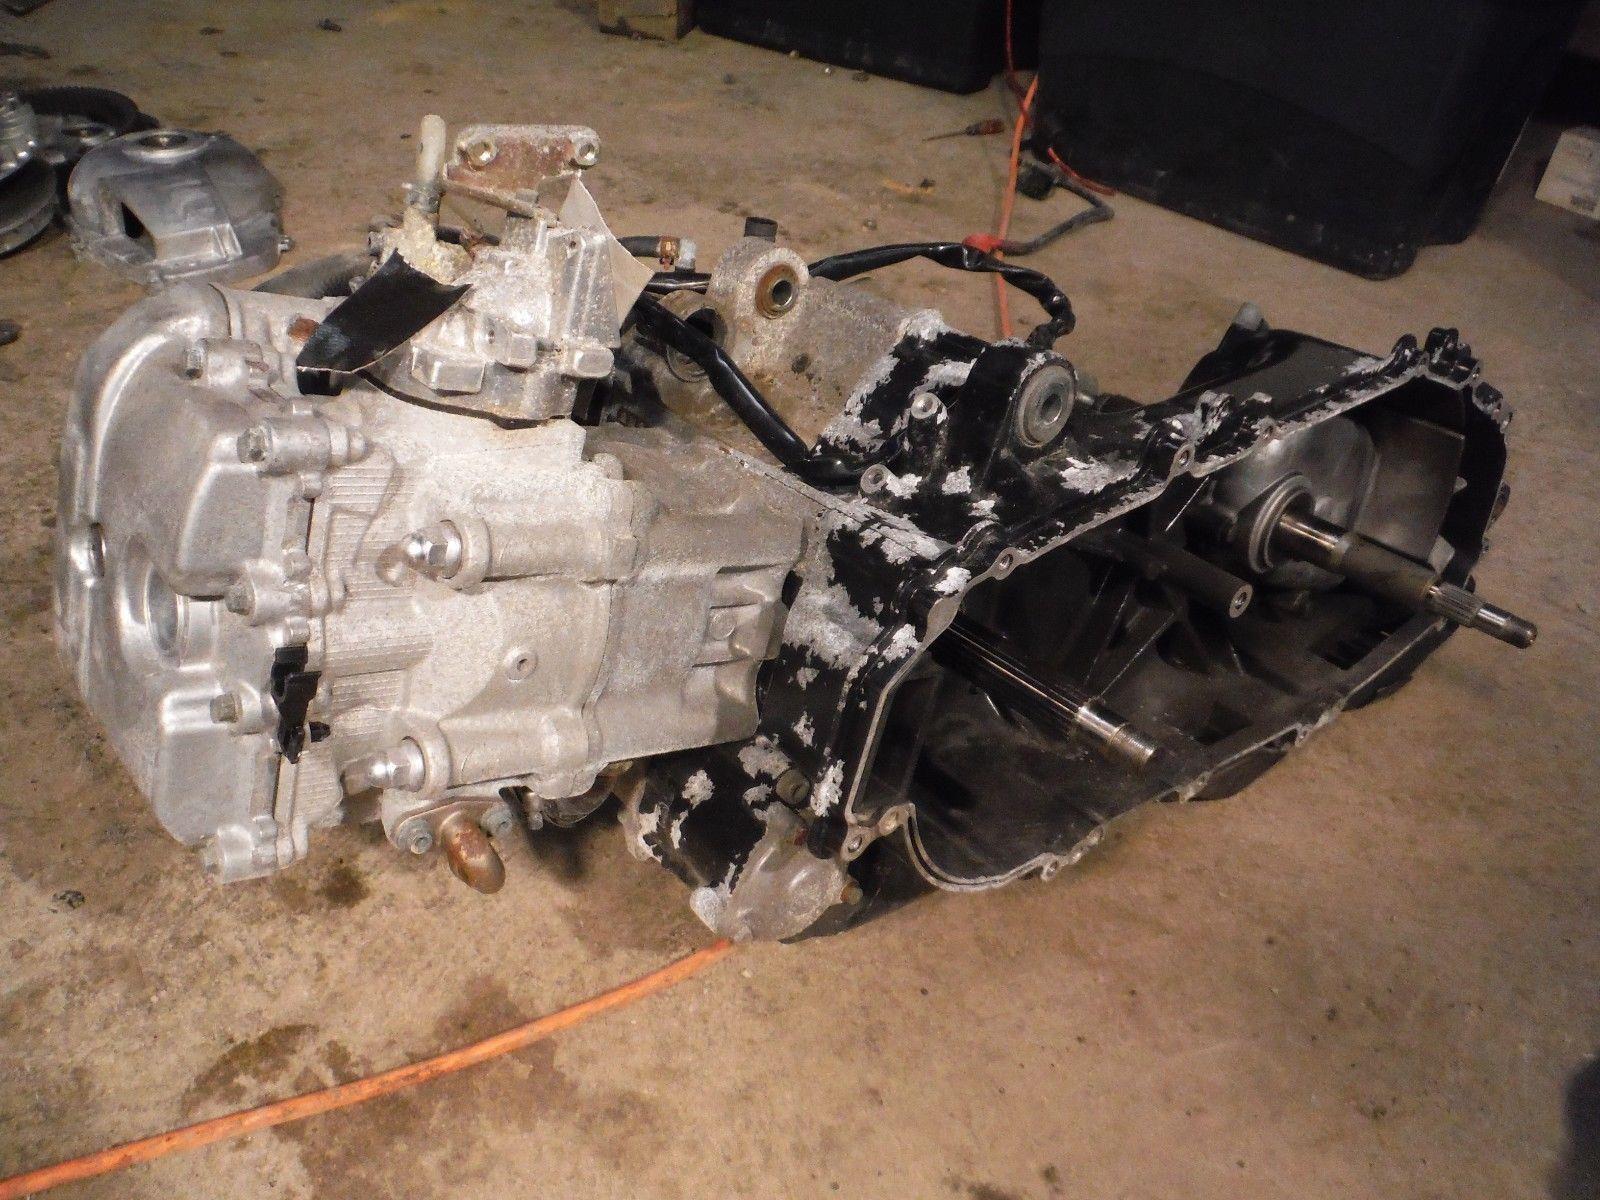 07 Yamaha Yp400 Majesty Engine 5 125 Miles Ran Great Ebay